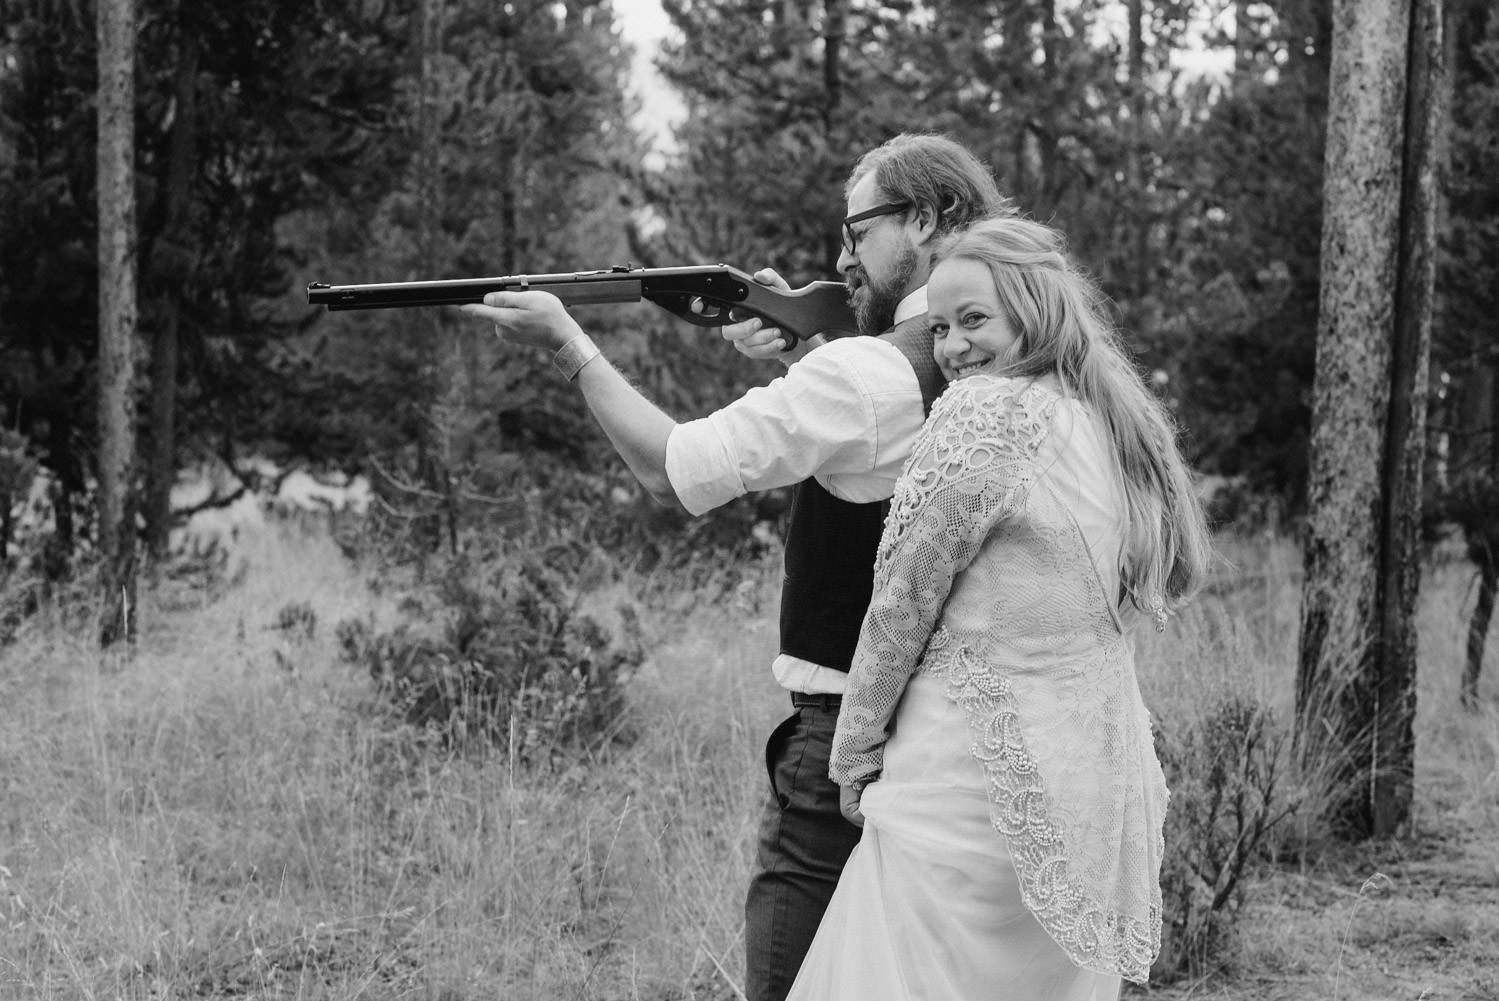 West Yellowstone Wedding bride and groom shooting shotguns photo